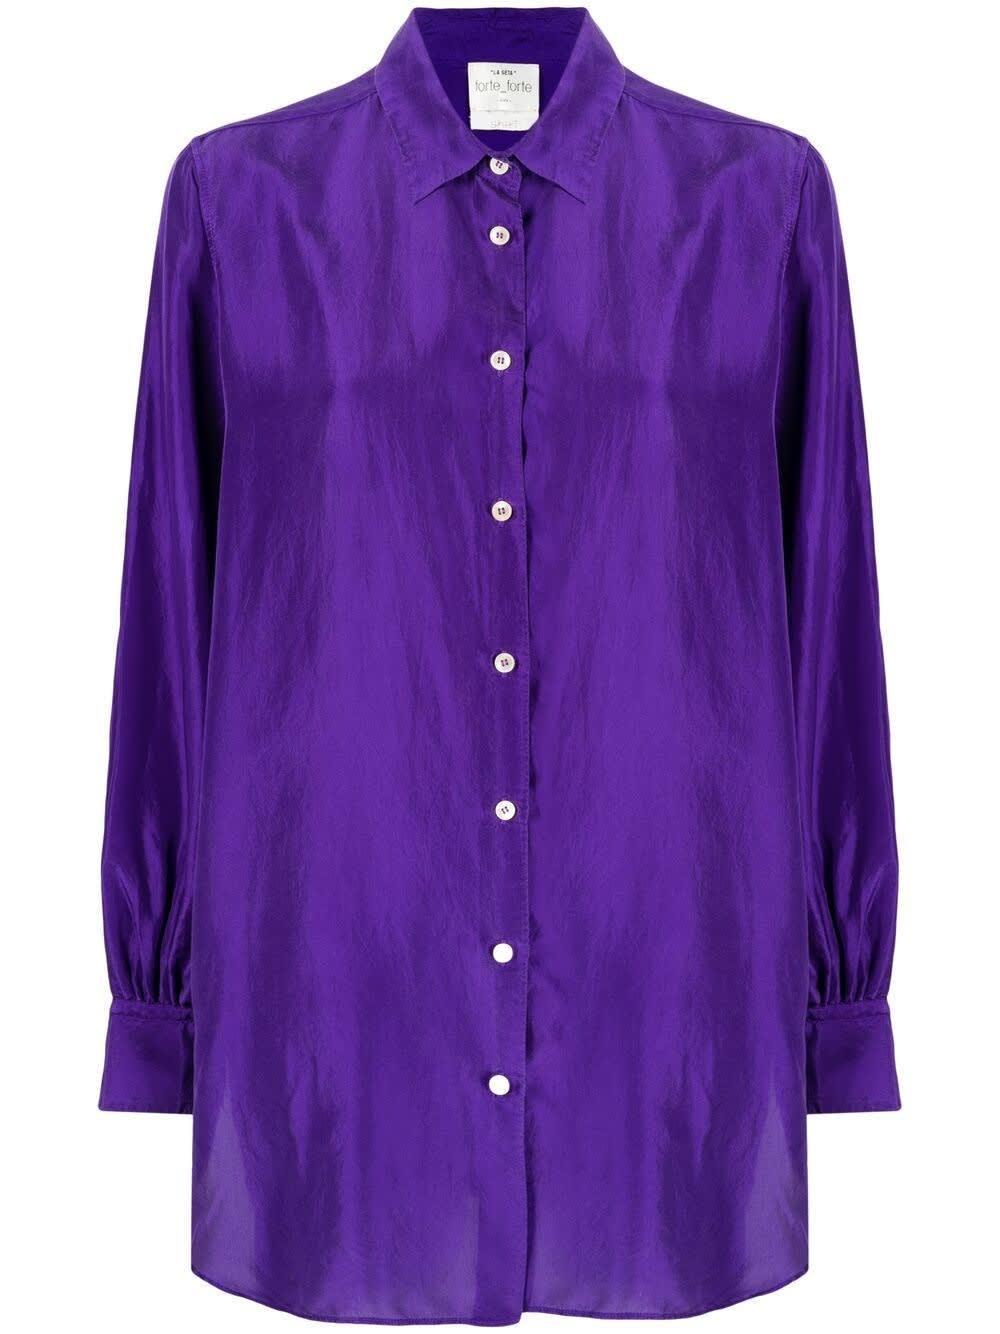 Forte Forte Clothing HABOTAI SHIRT IN PURPLE SILK